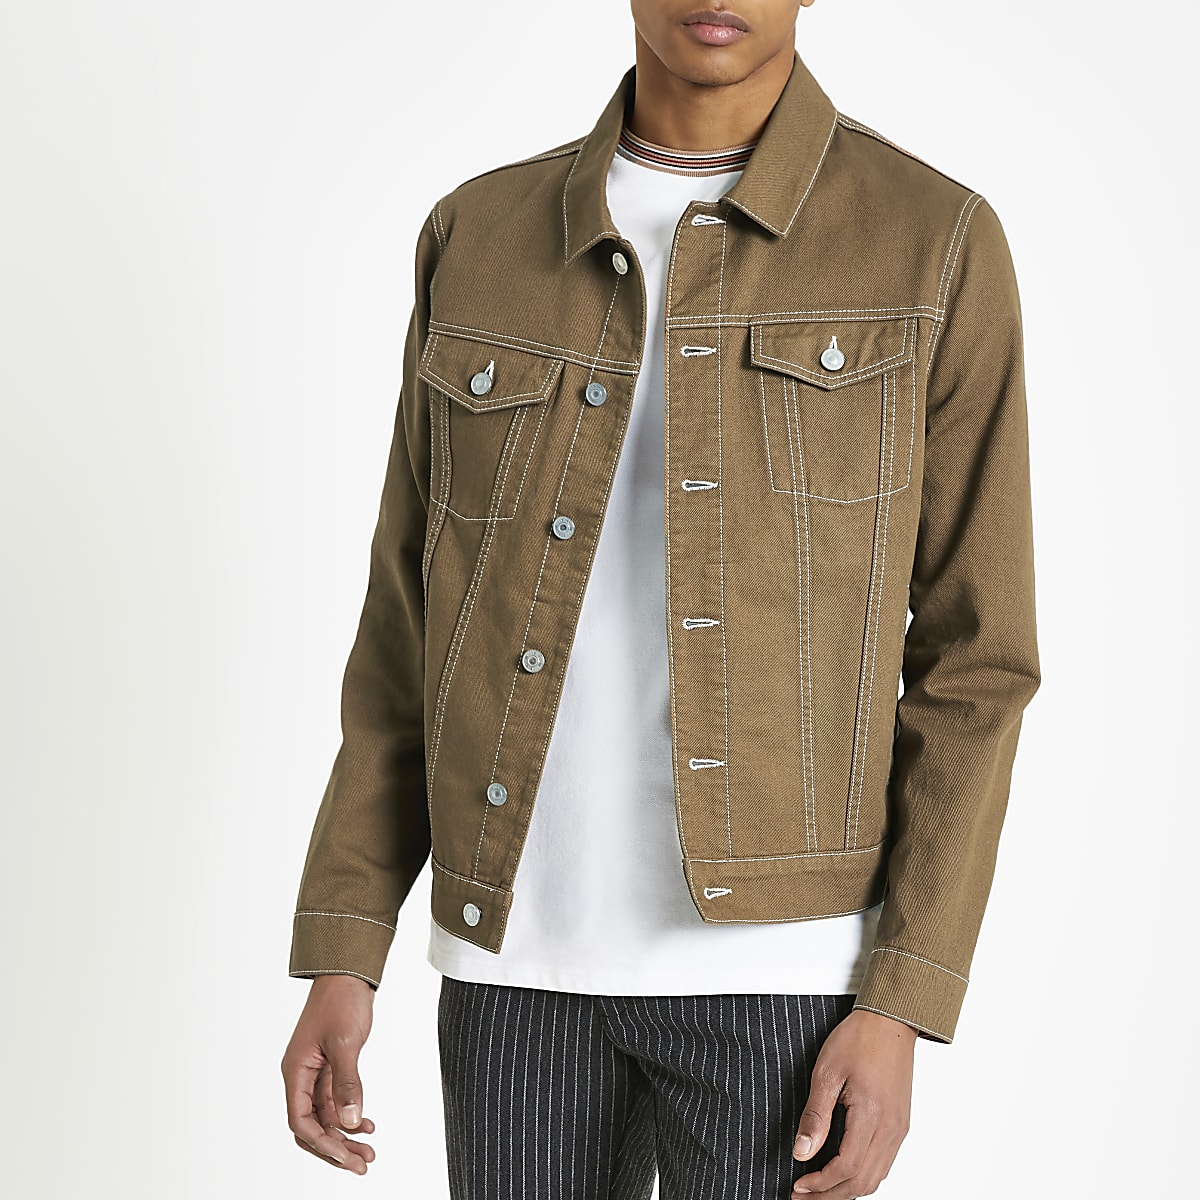 Braune Jeansjacke mit Kontrastnähten